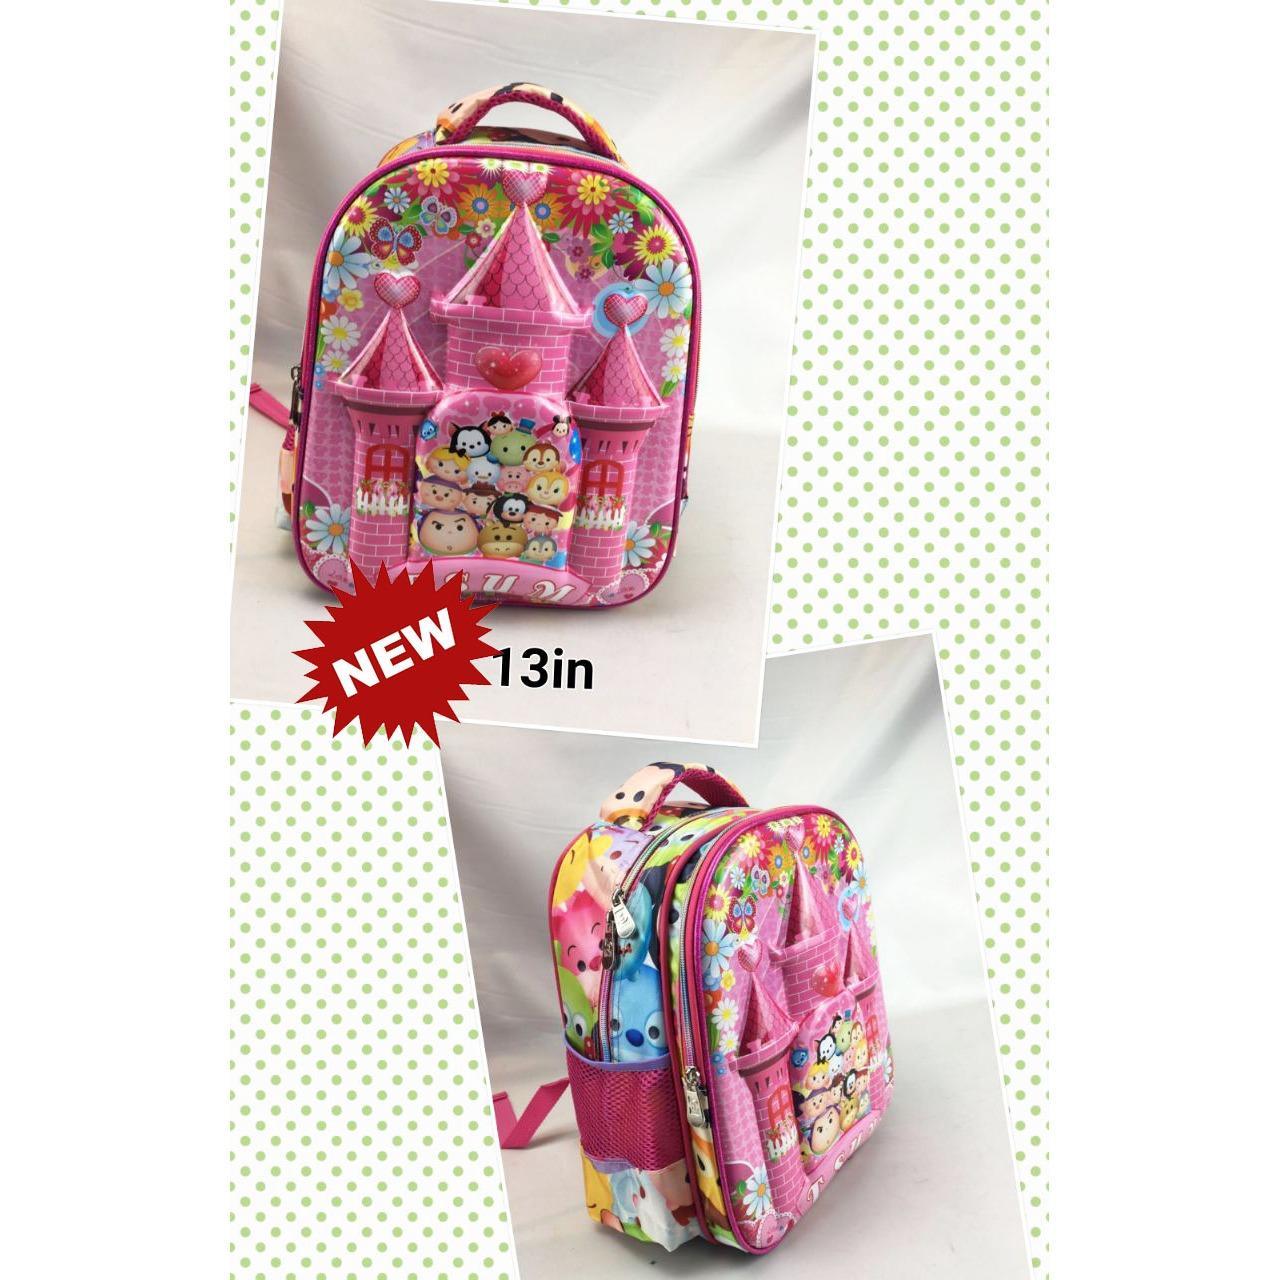 Onlan Tsum Tsum Cantik 6D Timbul Tas Ransel TK Import - Pink